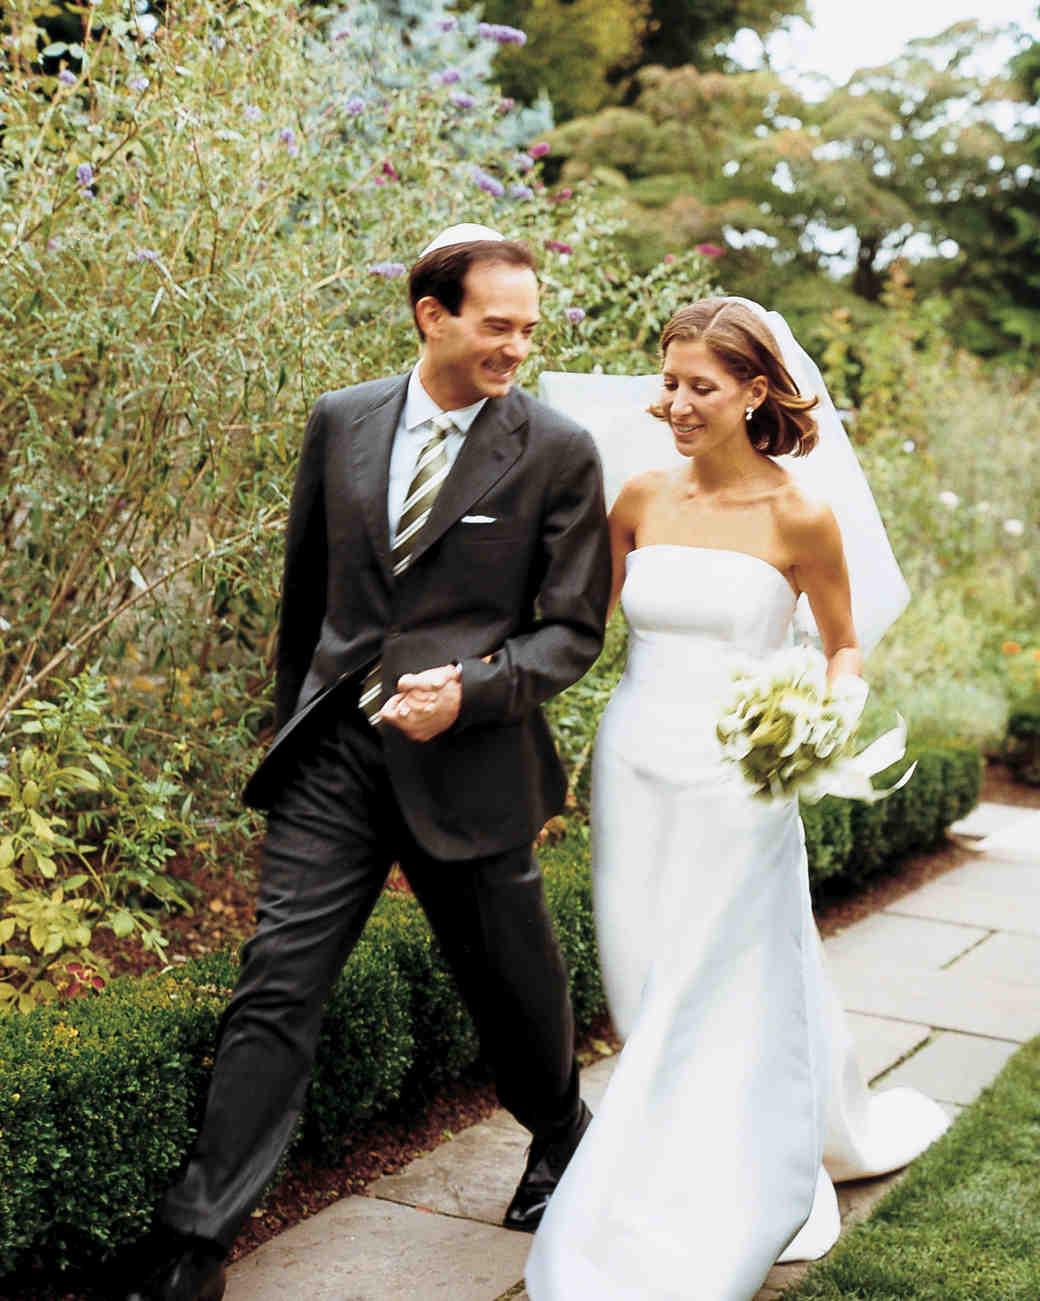 john-dolan-wedding-photographer-spring-2002-2-0914.jpg